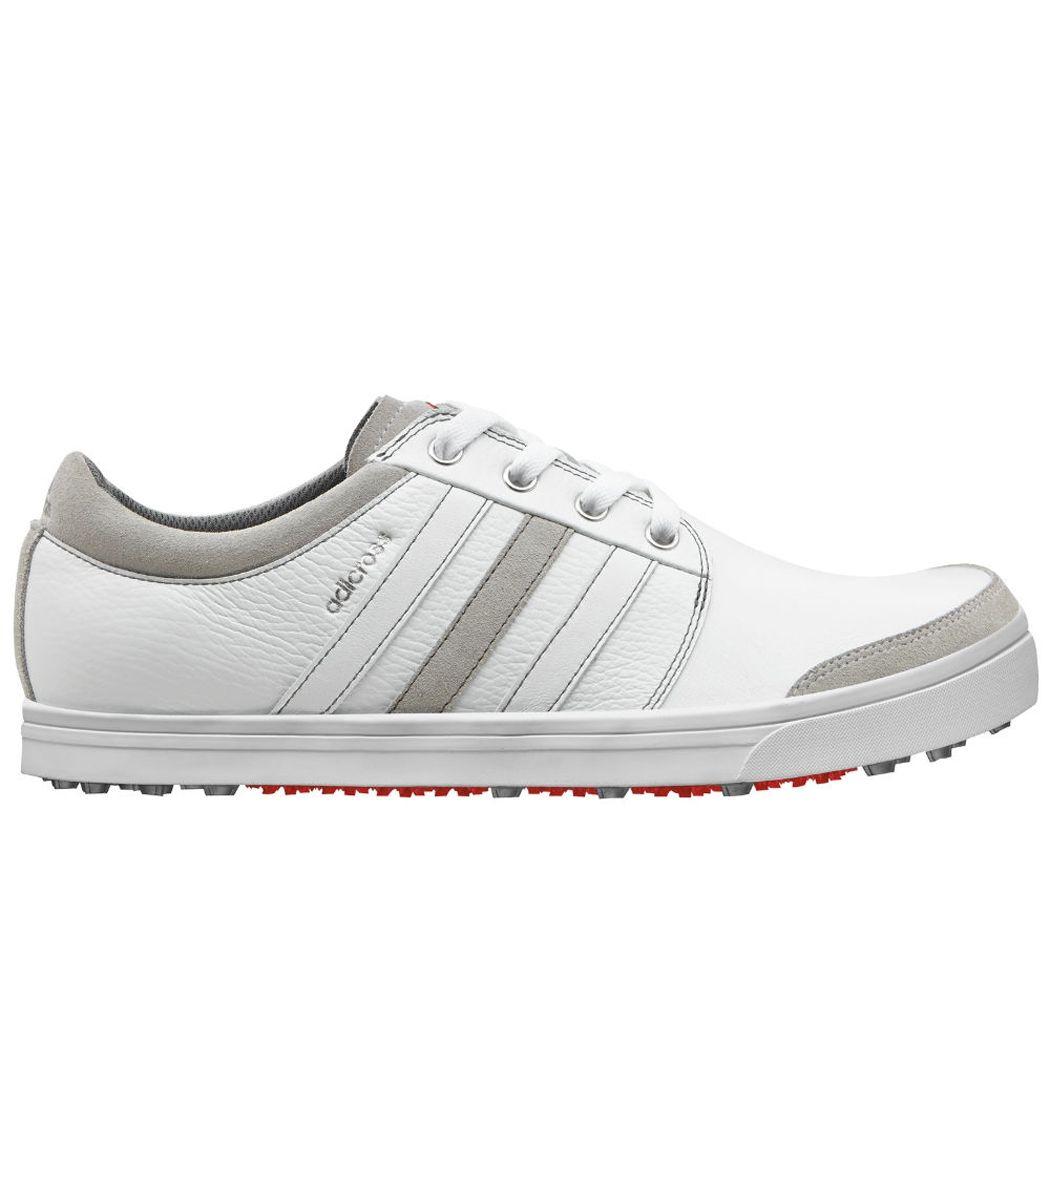 Buy Adidas adiCross Gripmore Golf Shoes White/Grey   Golf Discount